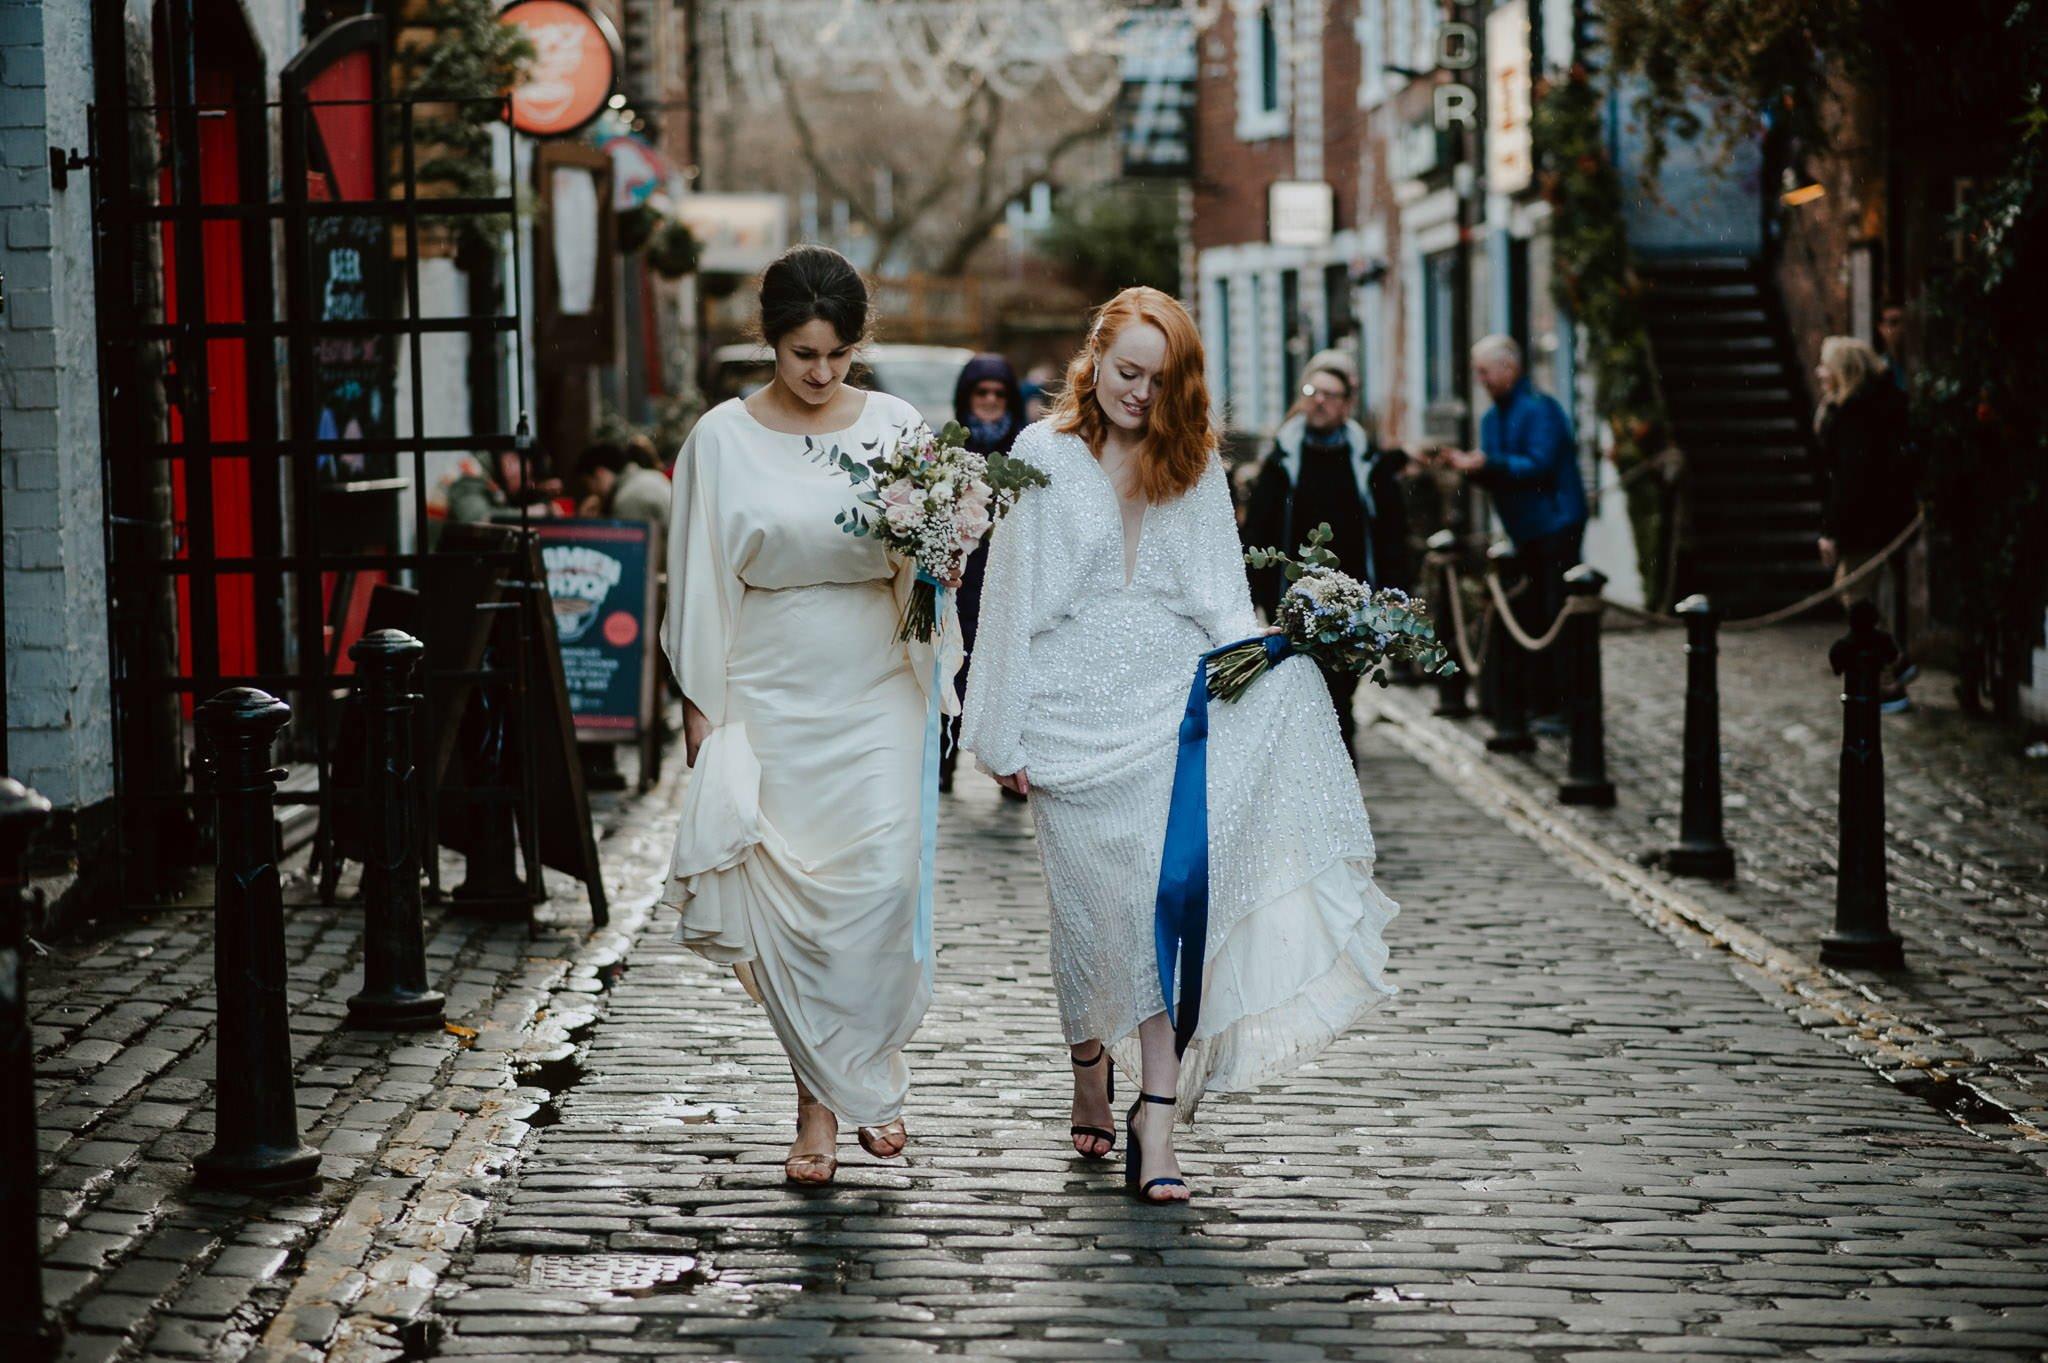 A Dreamy Pre-Raphaelite Wedding at the Bothy in Glasgow 44